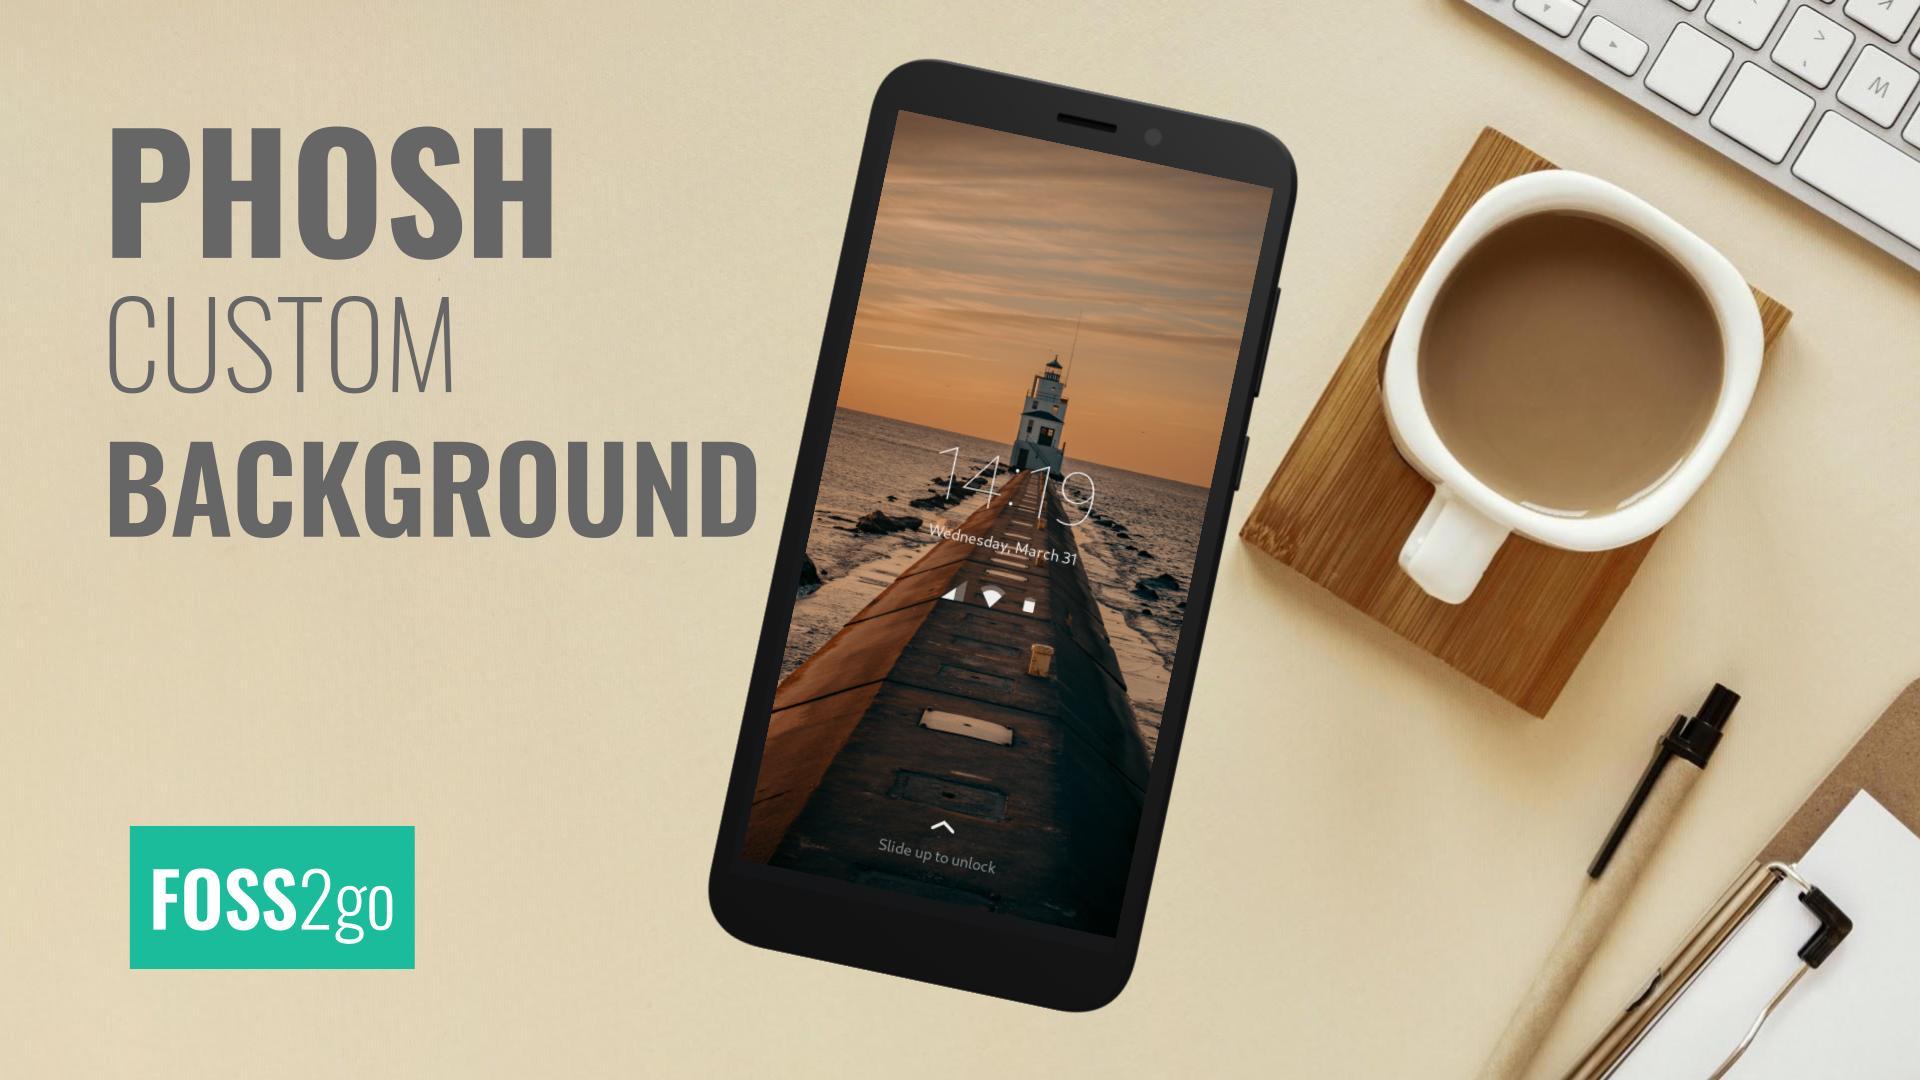 How to Add a Custom Background Phosh?